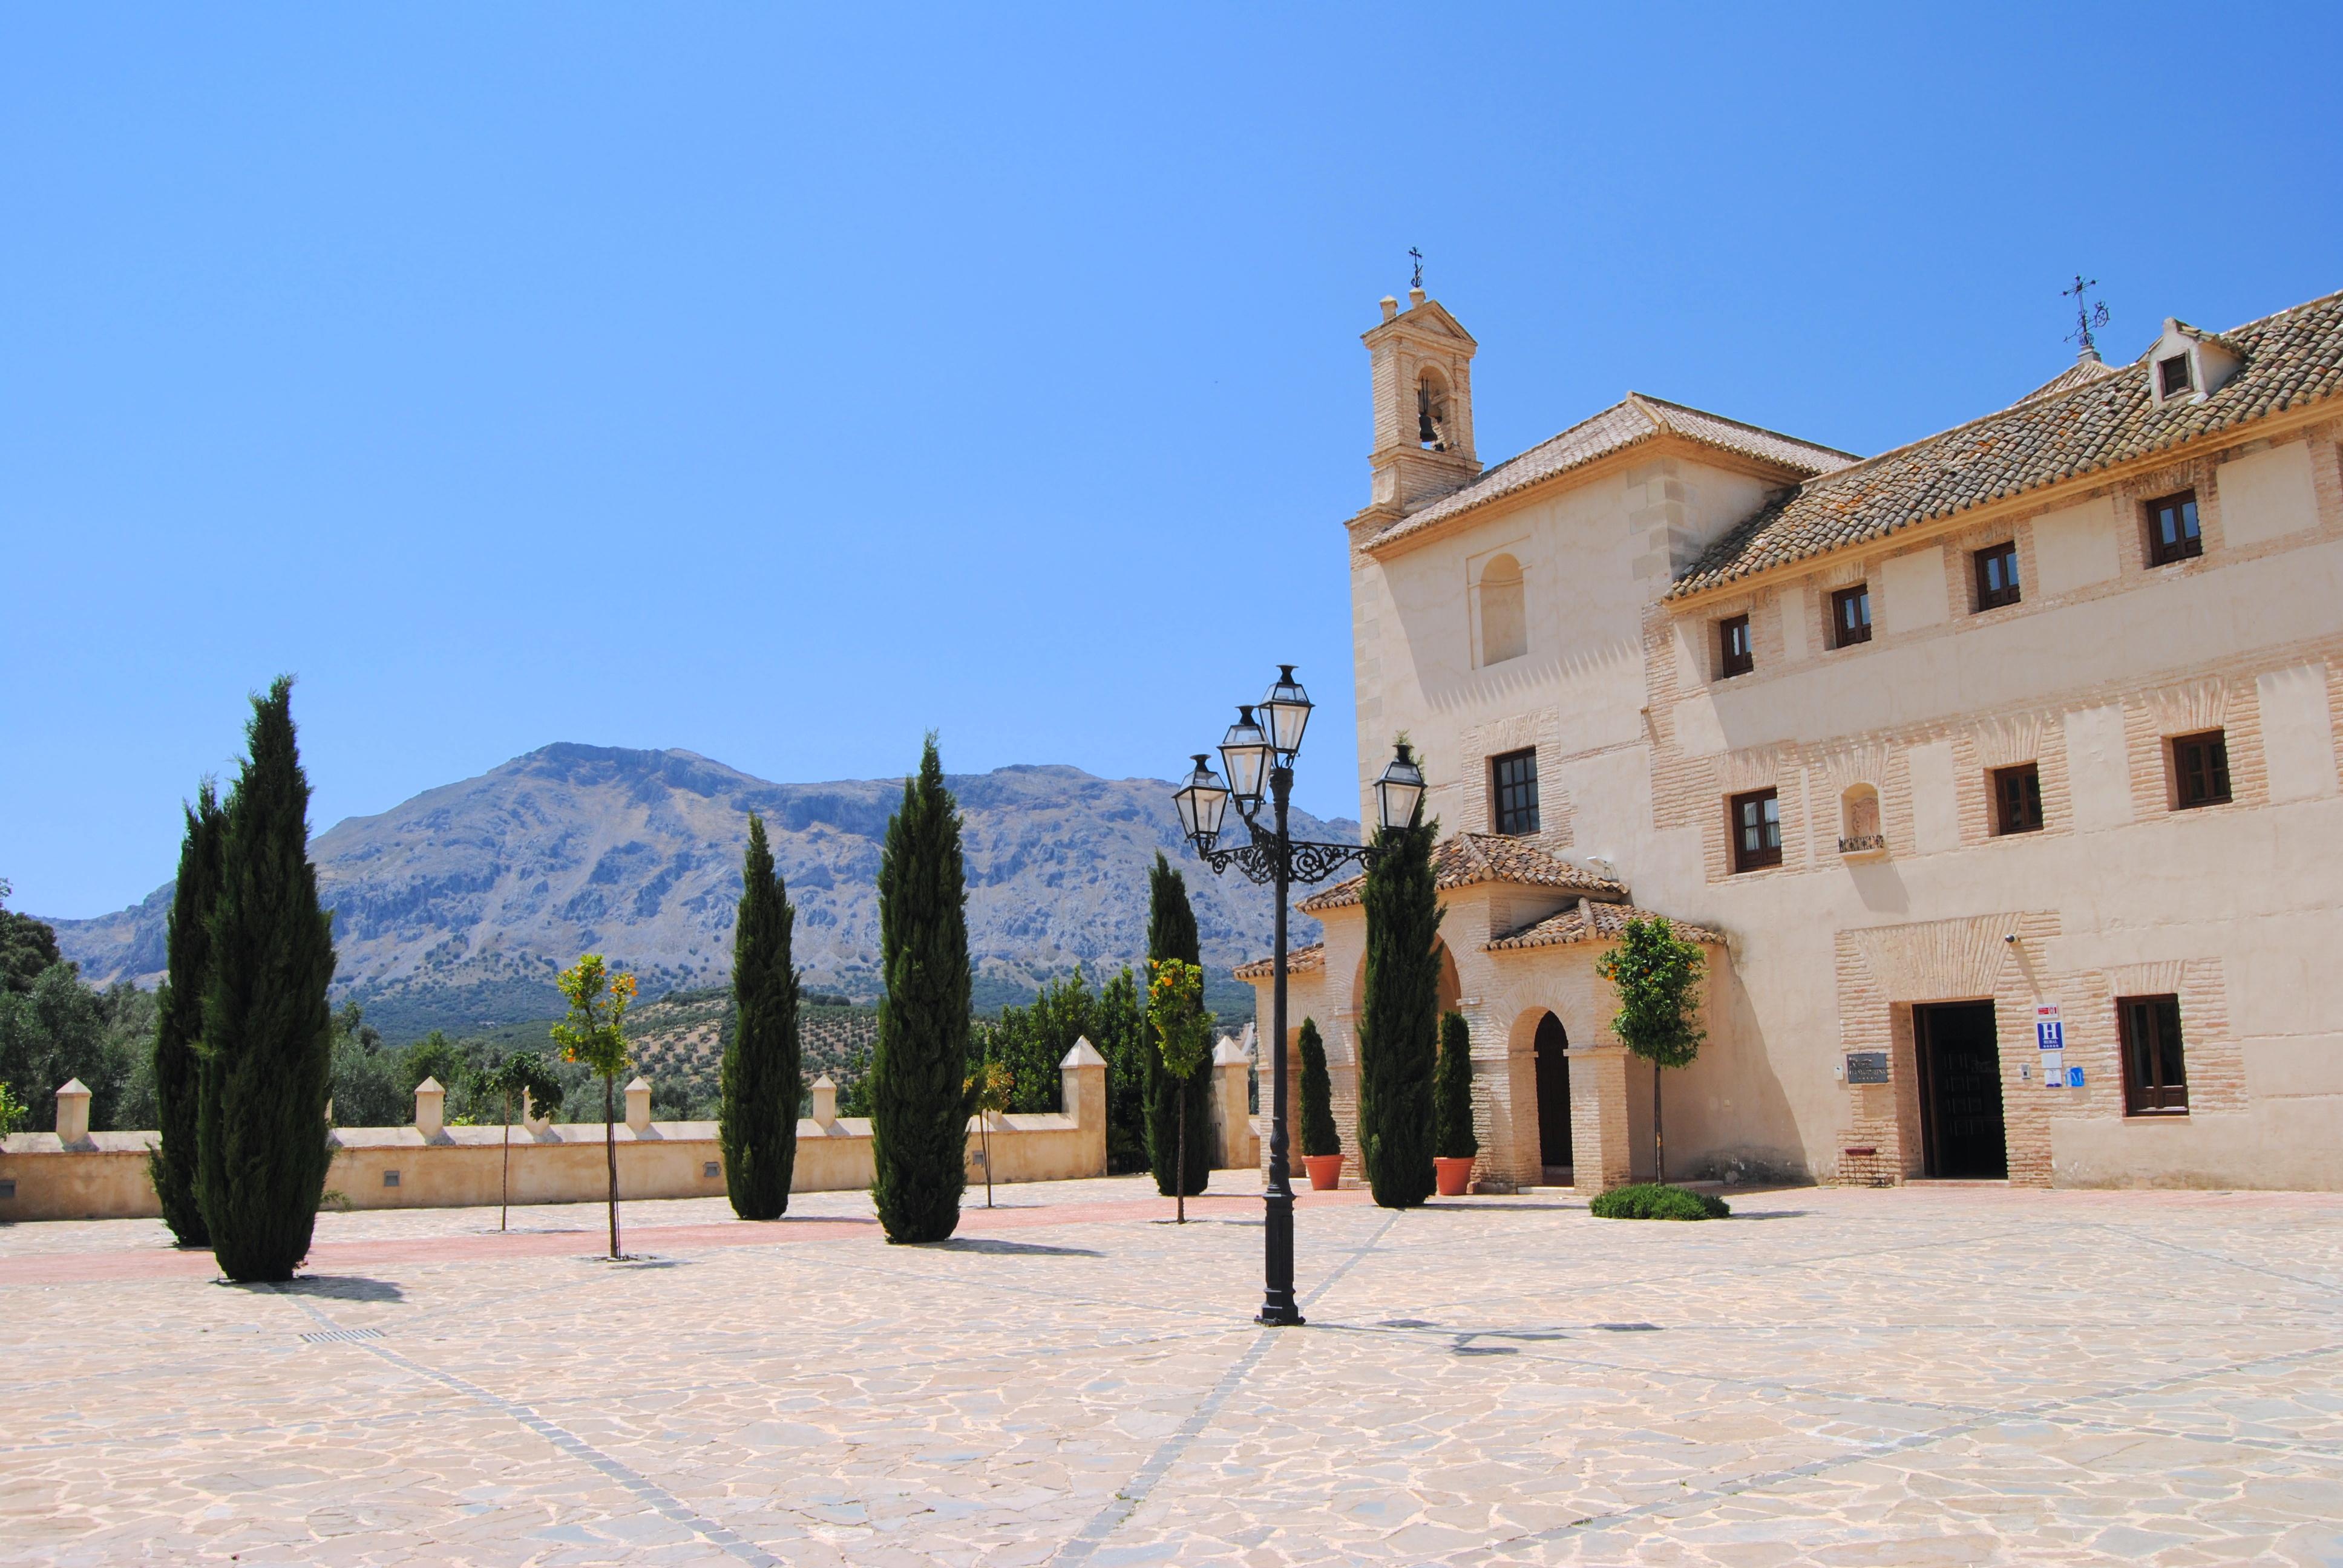 Charming hotels in malaga hotel convento la magdalena for Charming hotel